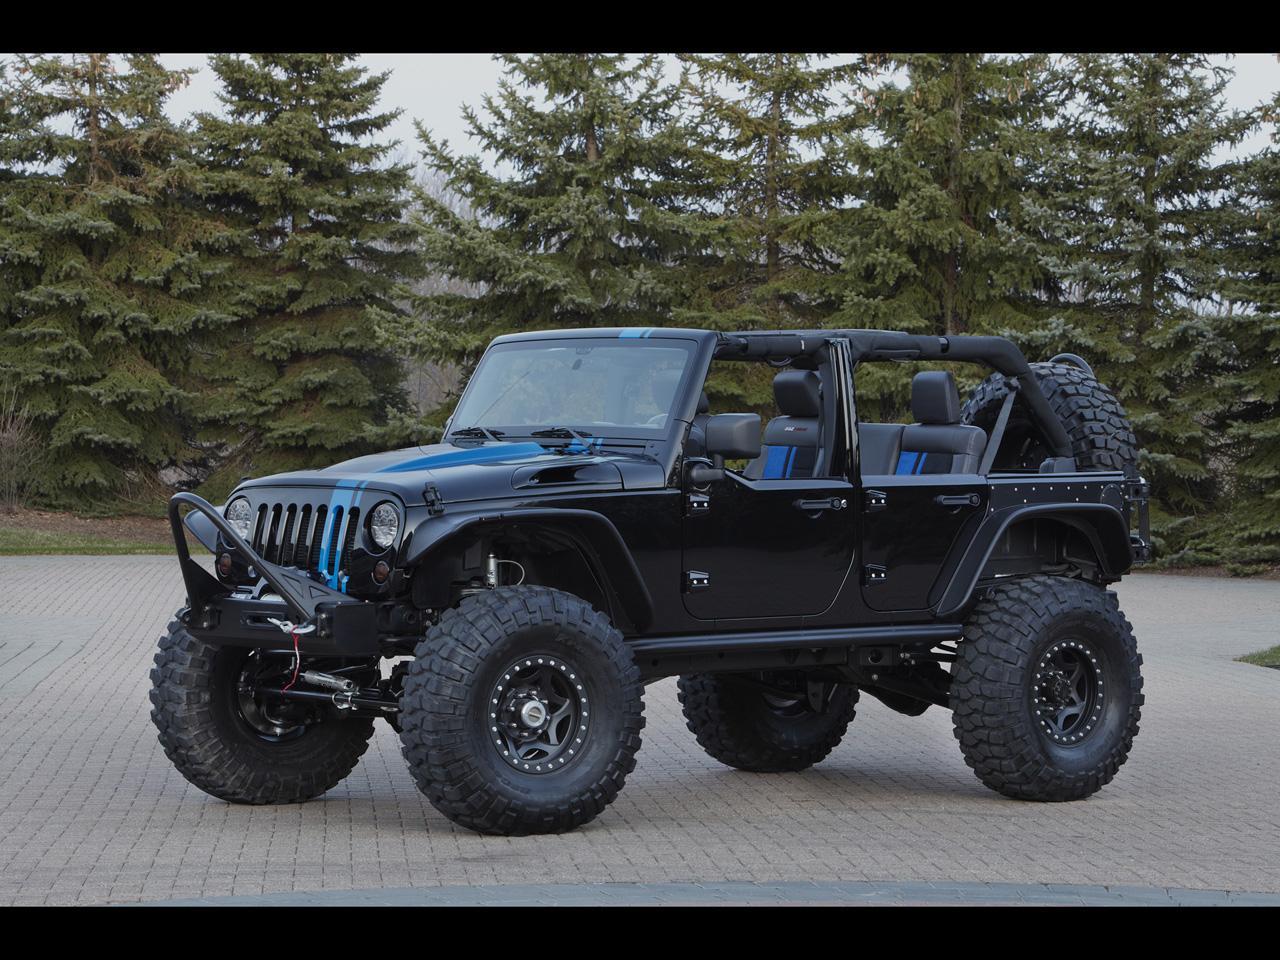 2012 Jeep Moab Easter Safari Concepts - Jeep Wrangler Apache - 1280x960 - Wallpaper